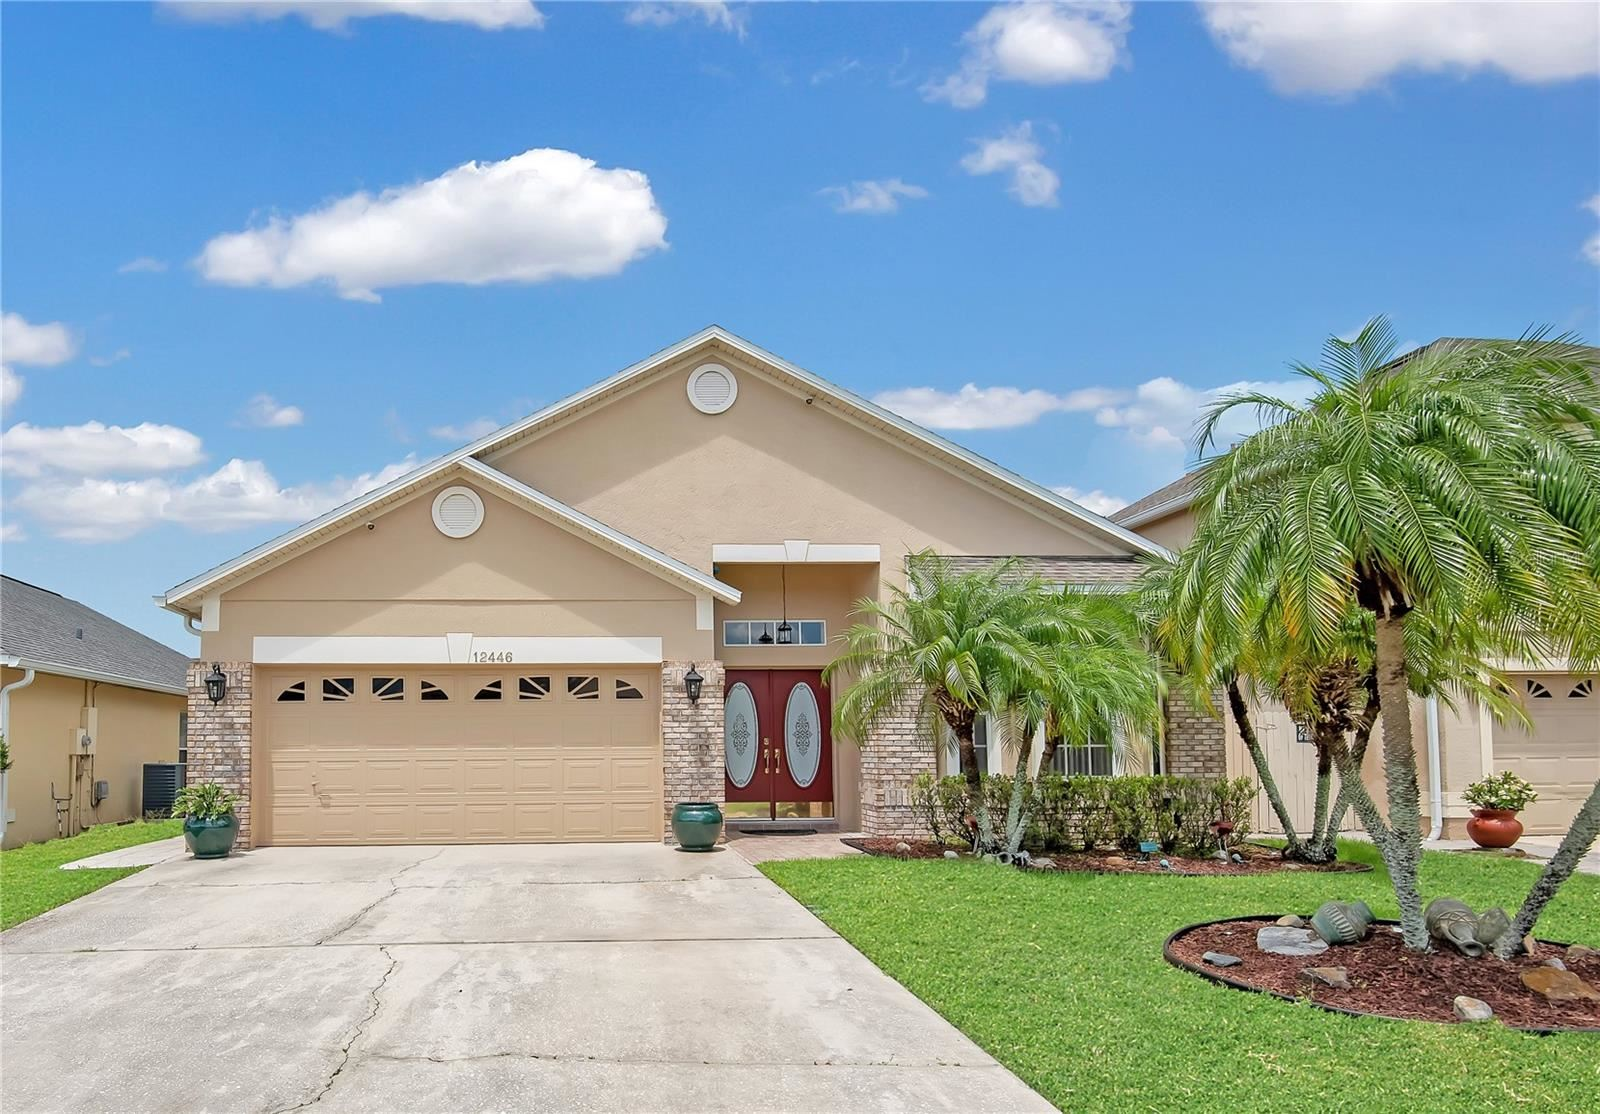 12446 BEACONTREE WAY, Orlando, FL 32837 - #: O5959603